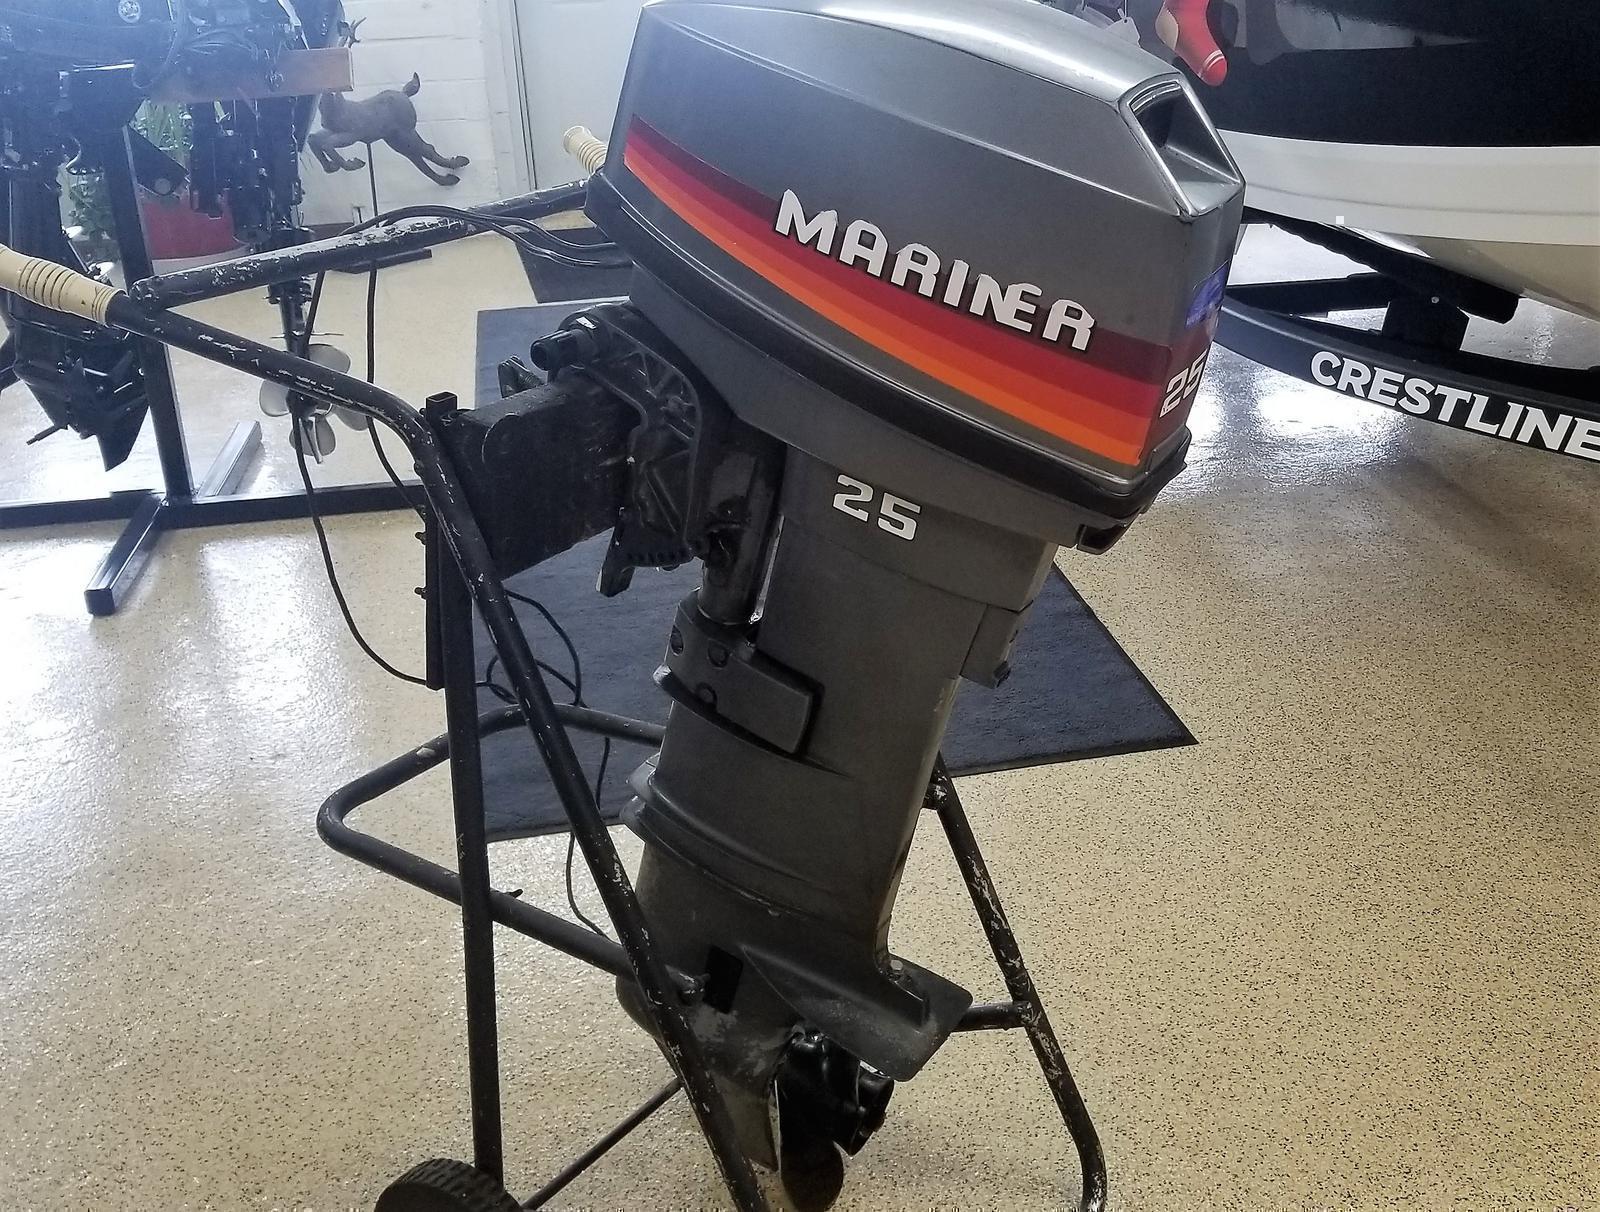 Inventory from Mariner and Mercury Marine Engines Mapleton